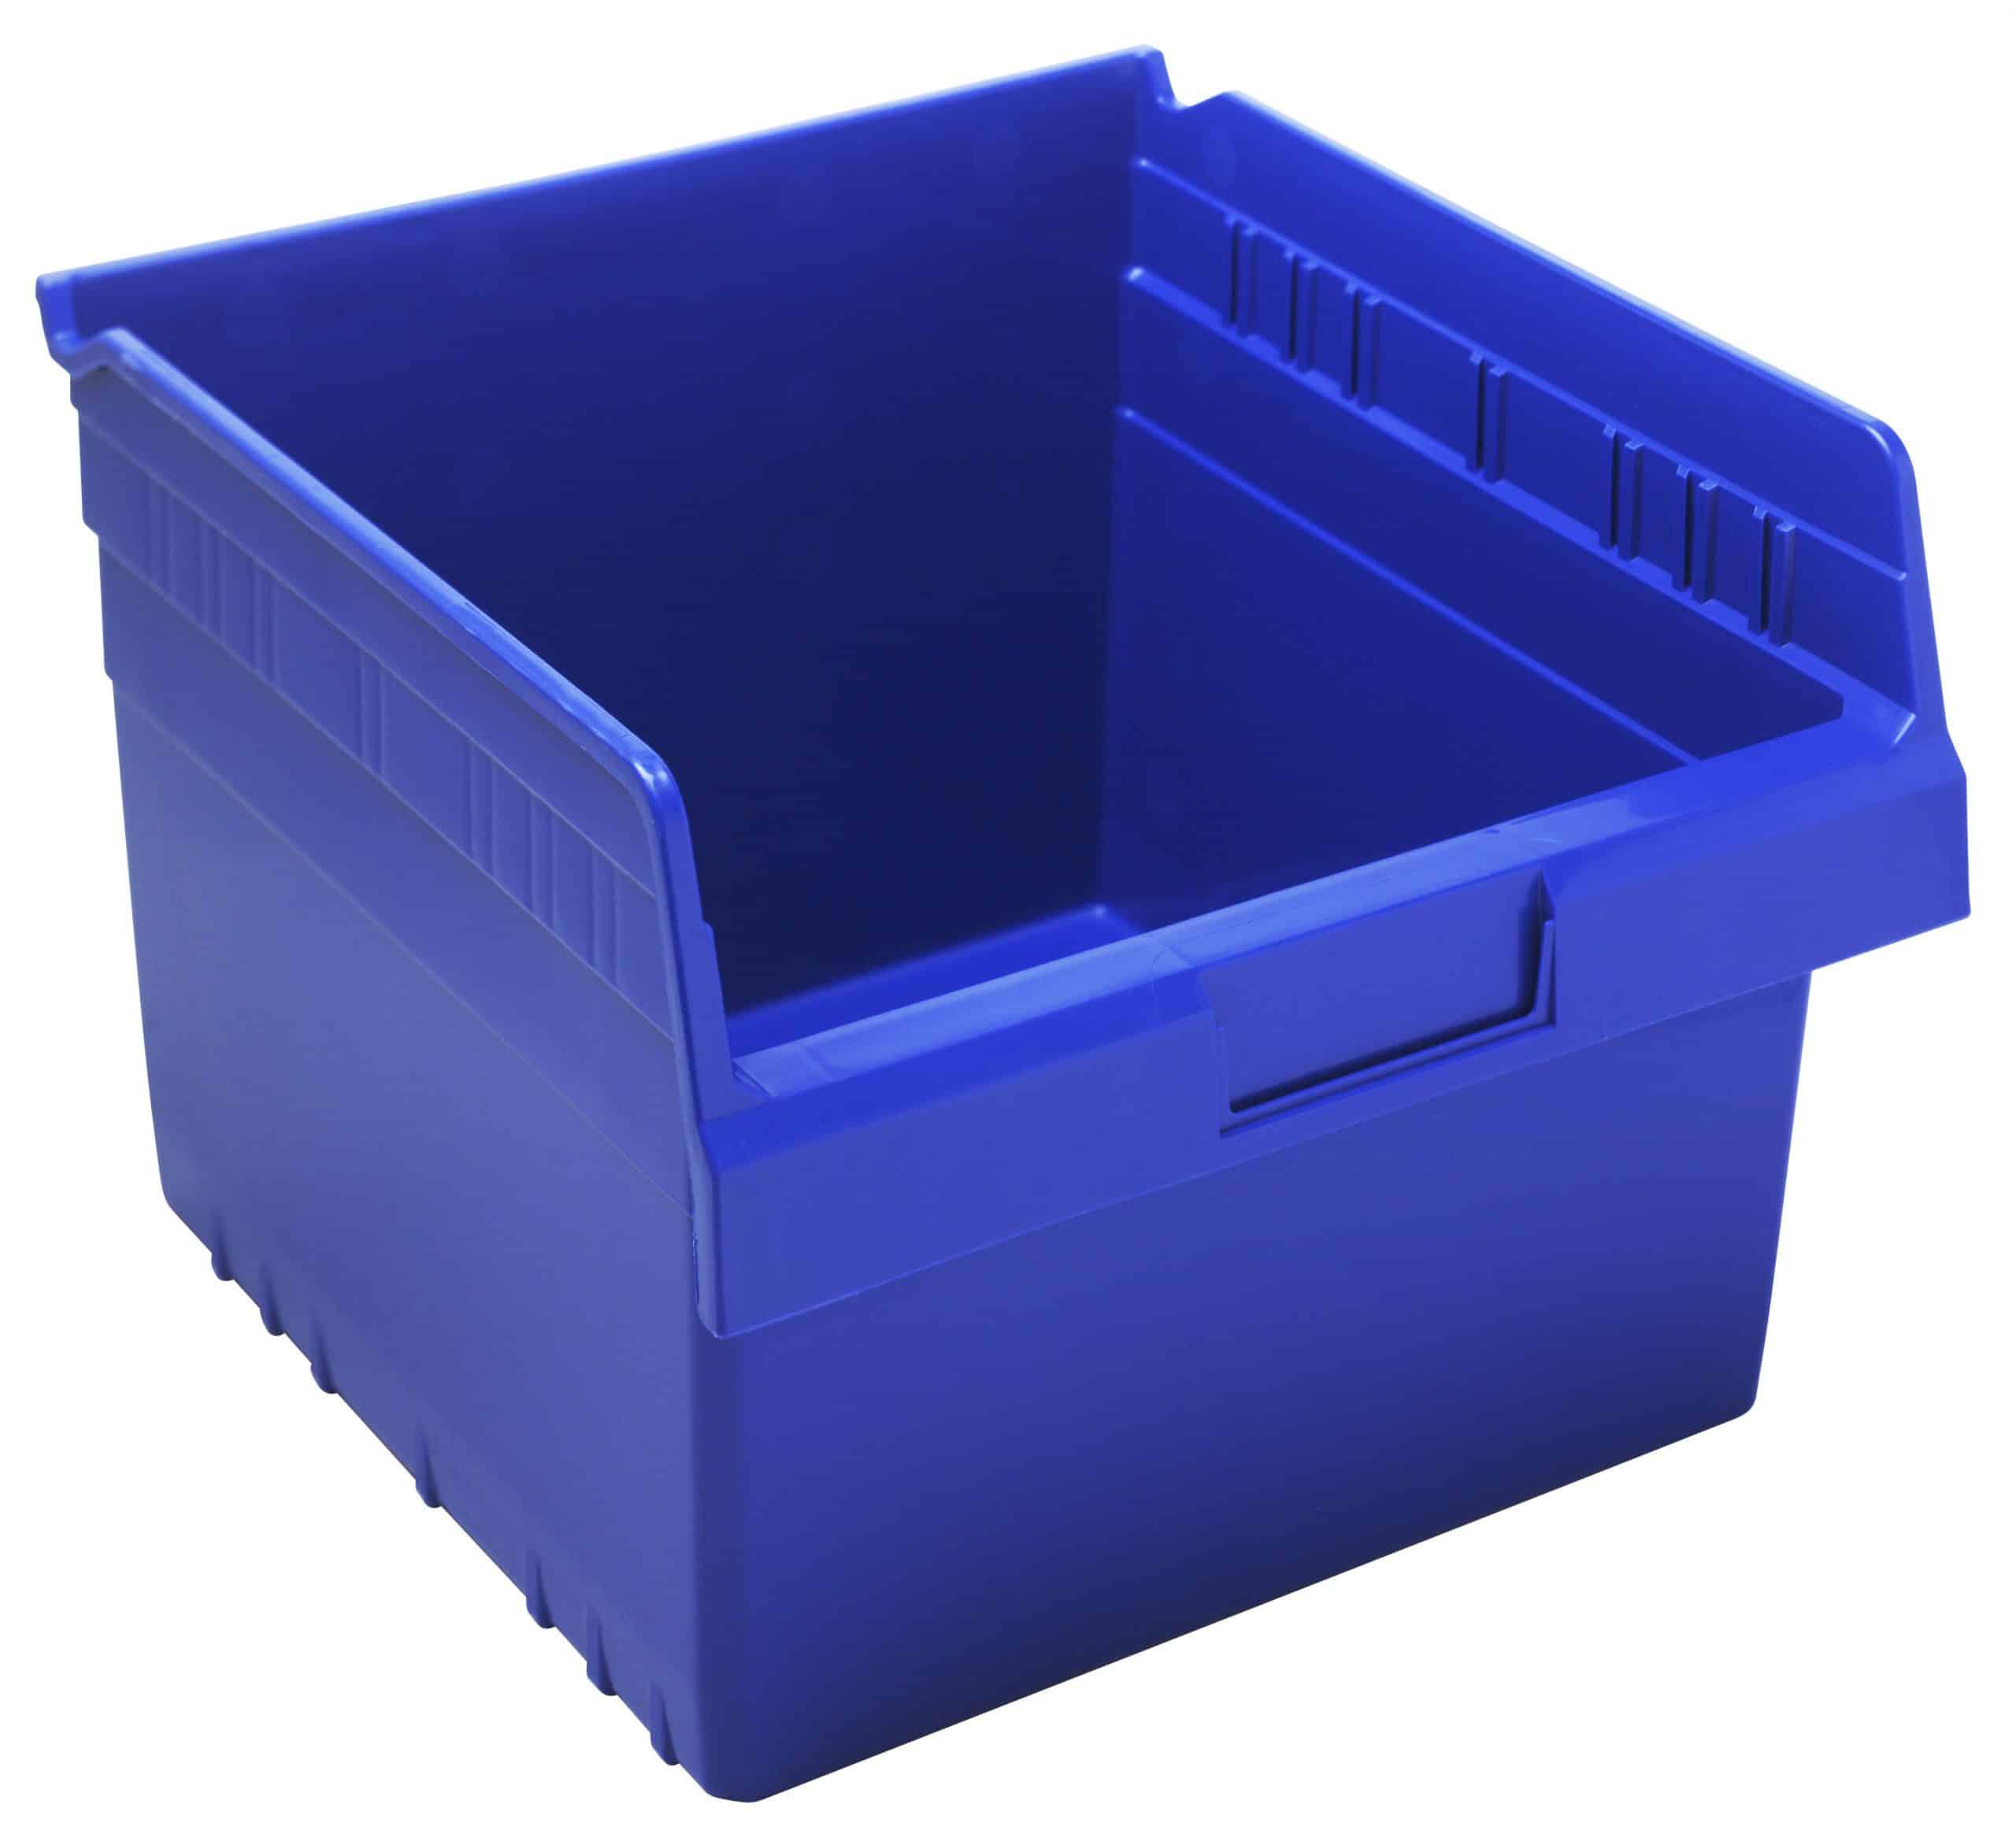 QSB809 blue